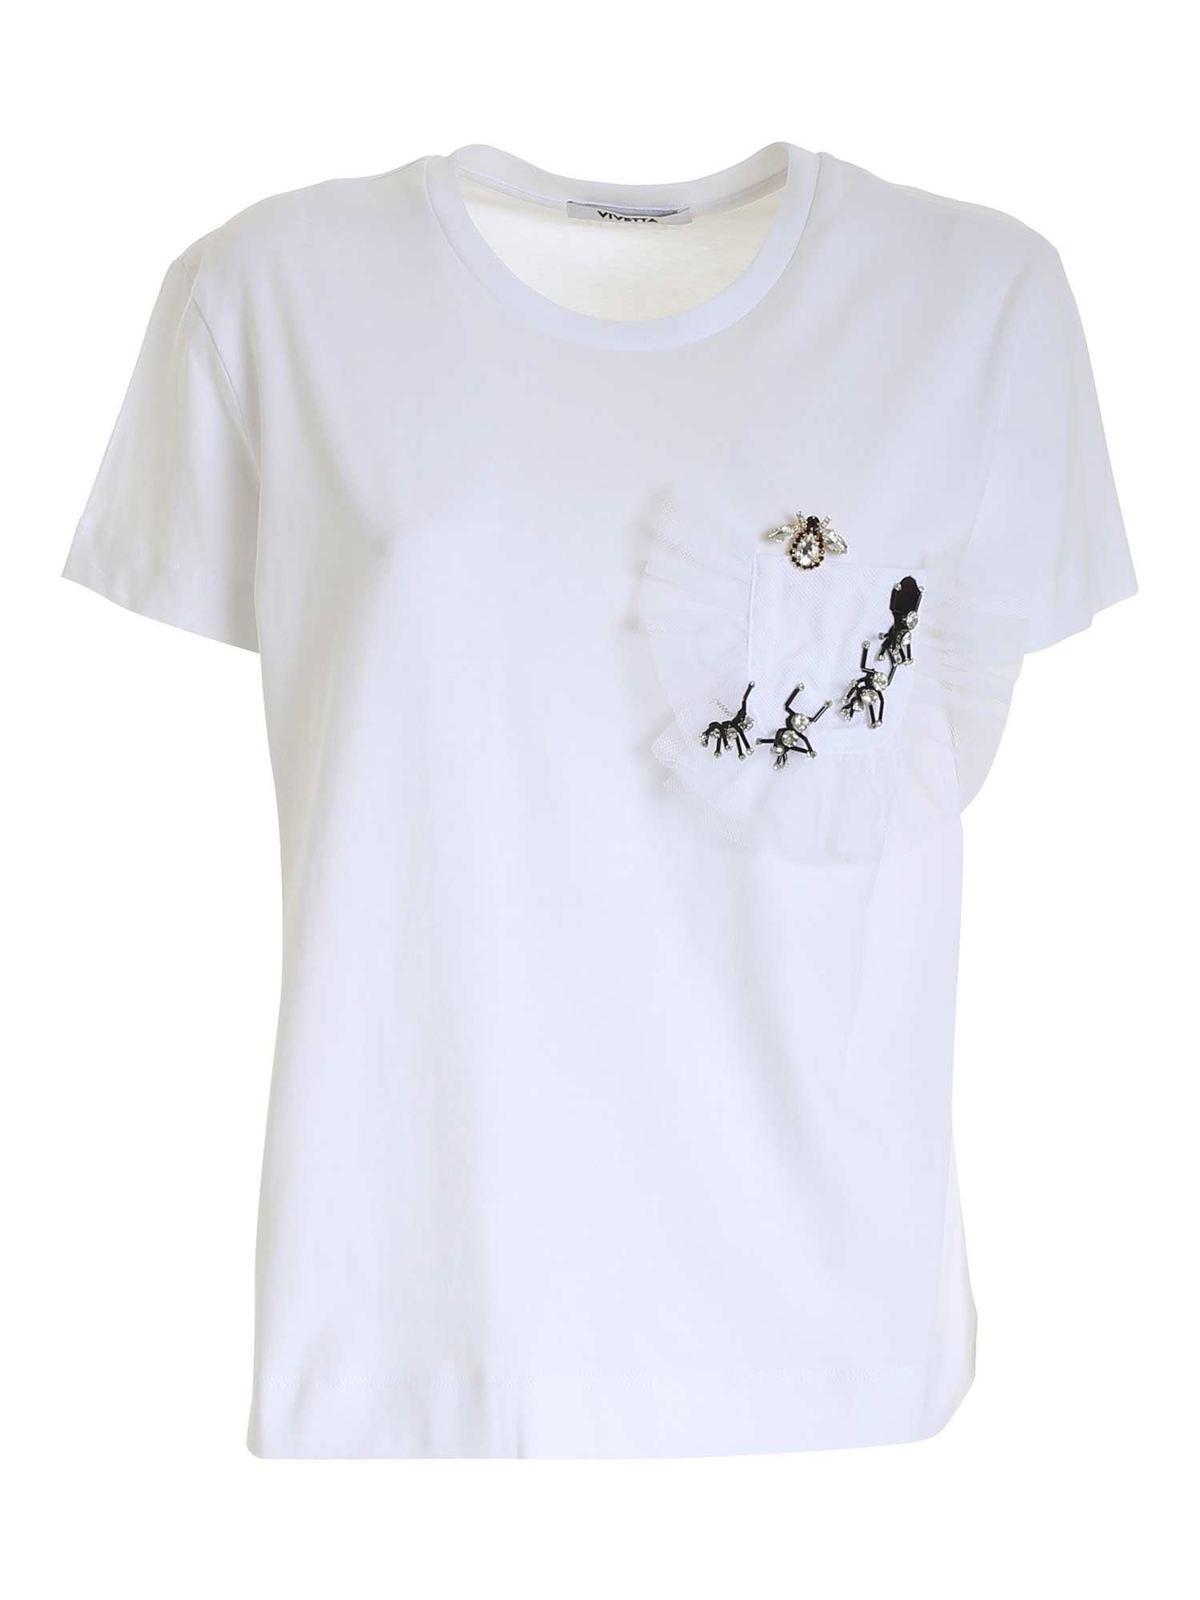 Vivetta DECORATION DETAIL T-SHIRT IN WHITE